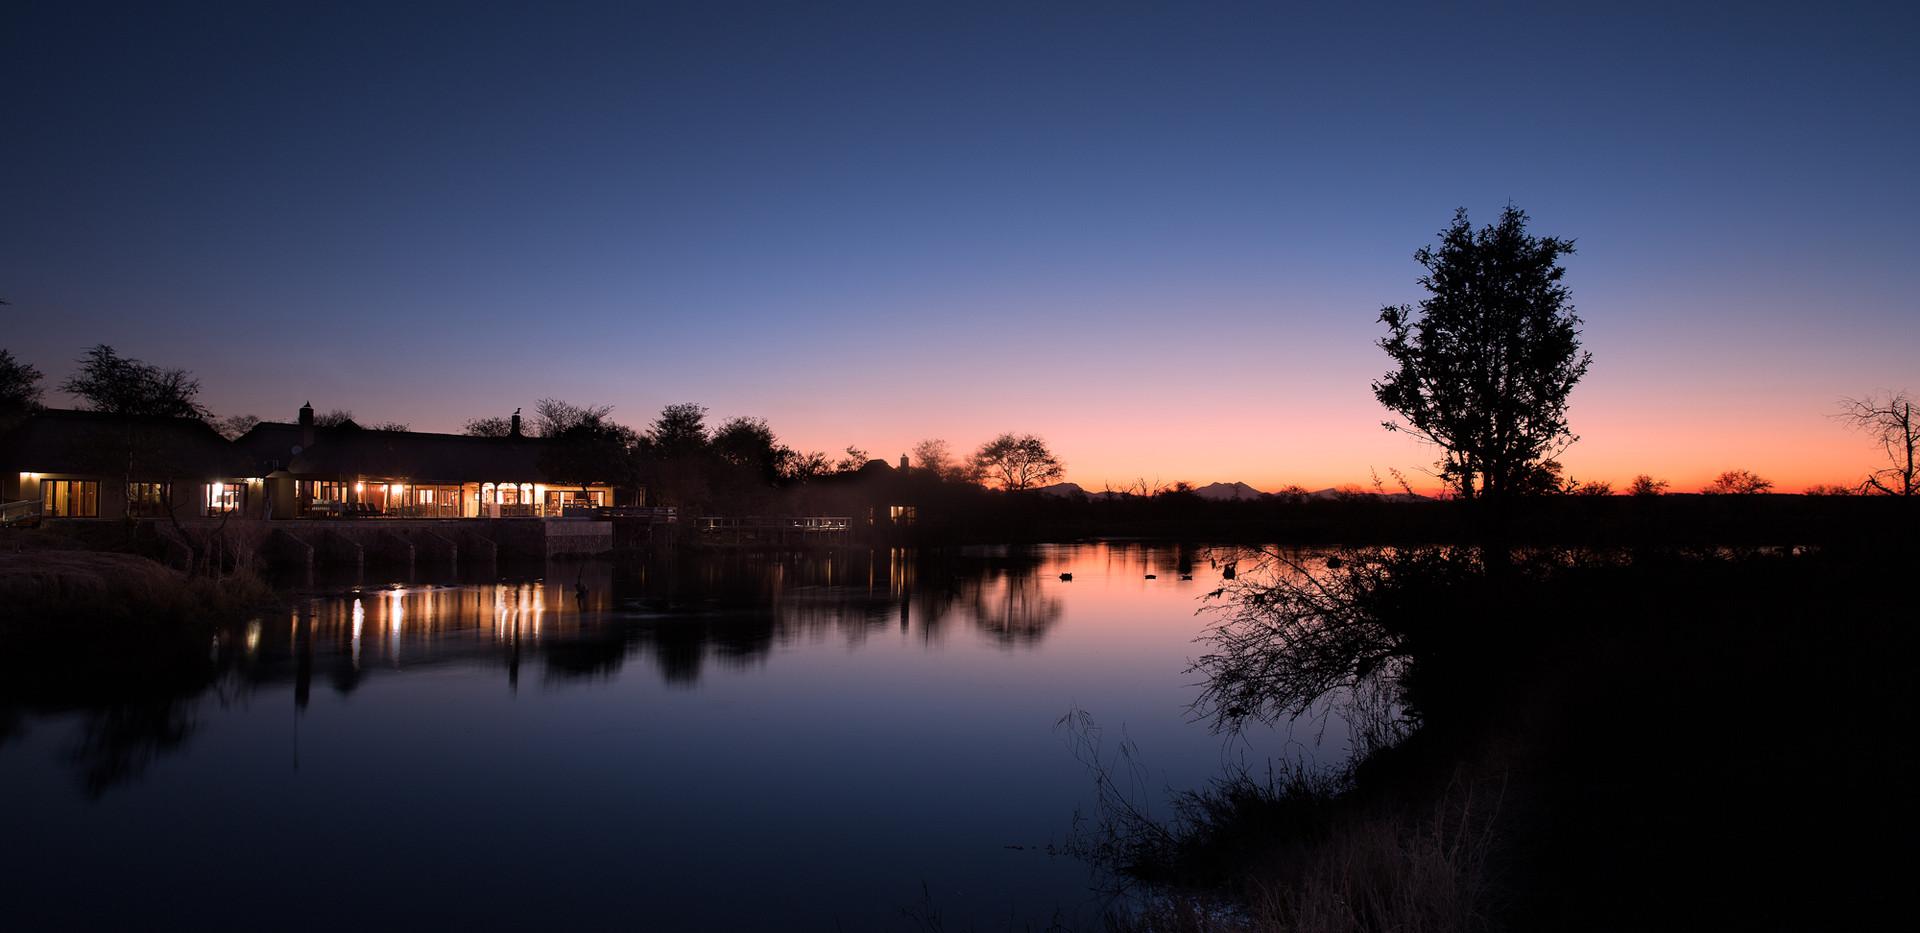 Sunset at Weaver's Nest Lodge